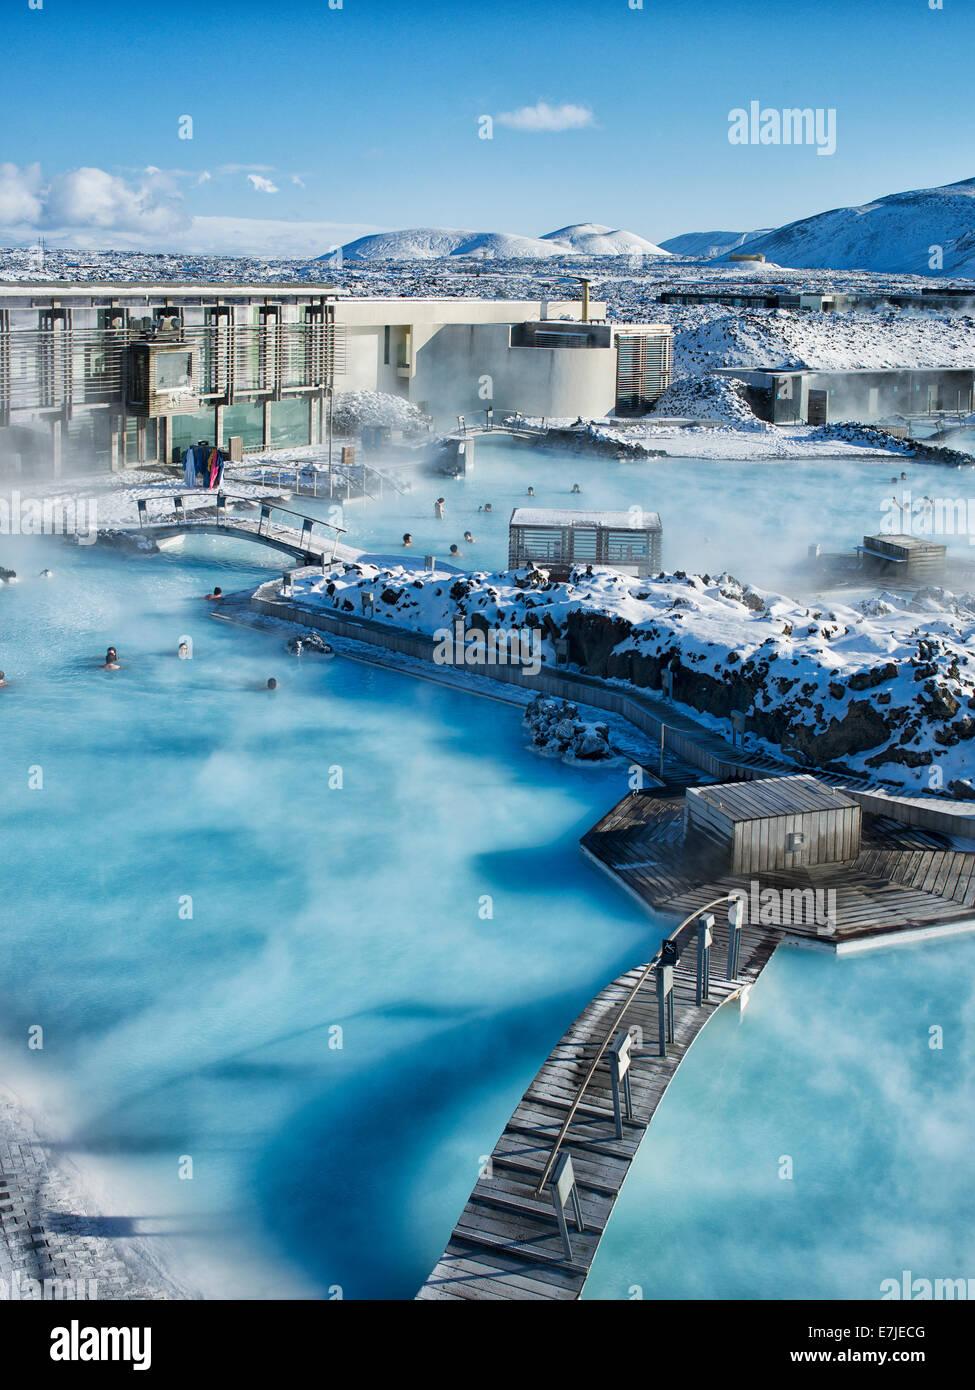 Souvent Blue lagoon, Blue, Polar sea, Grindavik, Gruindavik, island  ZR24